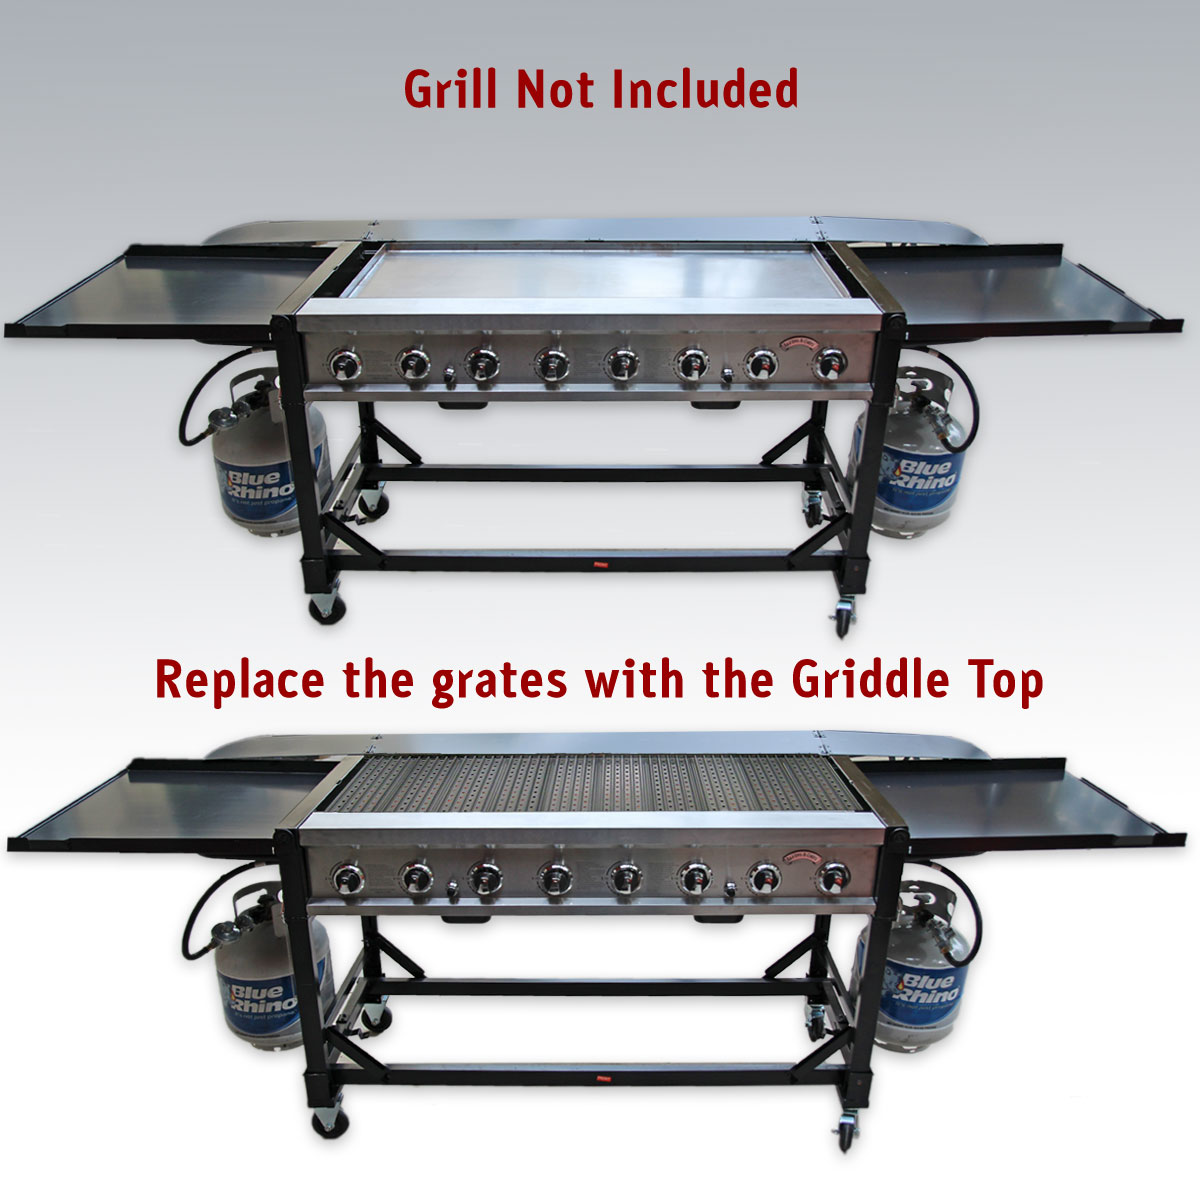 Griddle Master Full Griddle Top Commercial Version for Members Mark or Bakers  Chef  Griddle